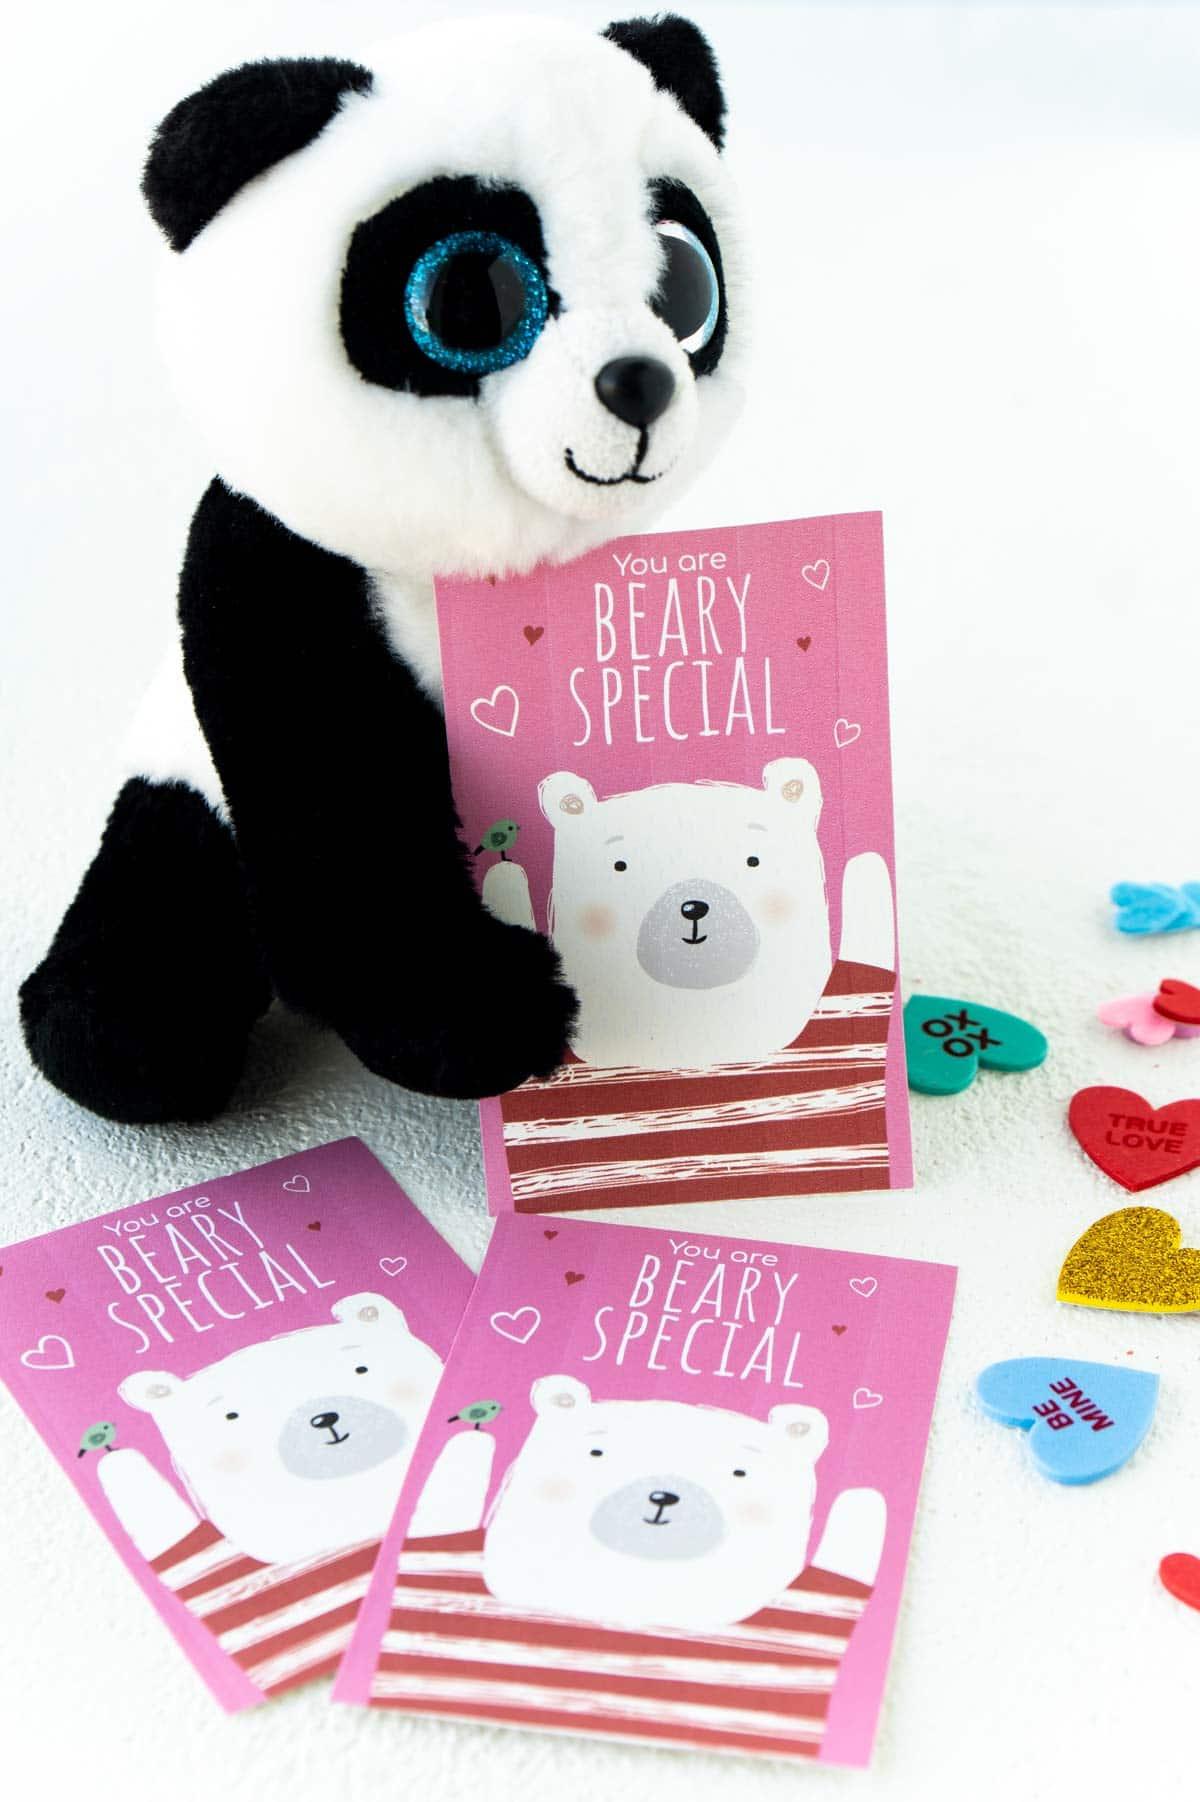 Bear valentine with a stuffed panda bear